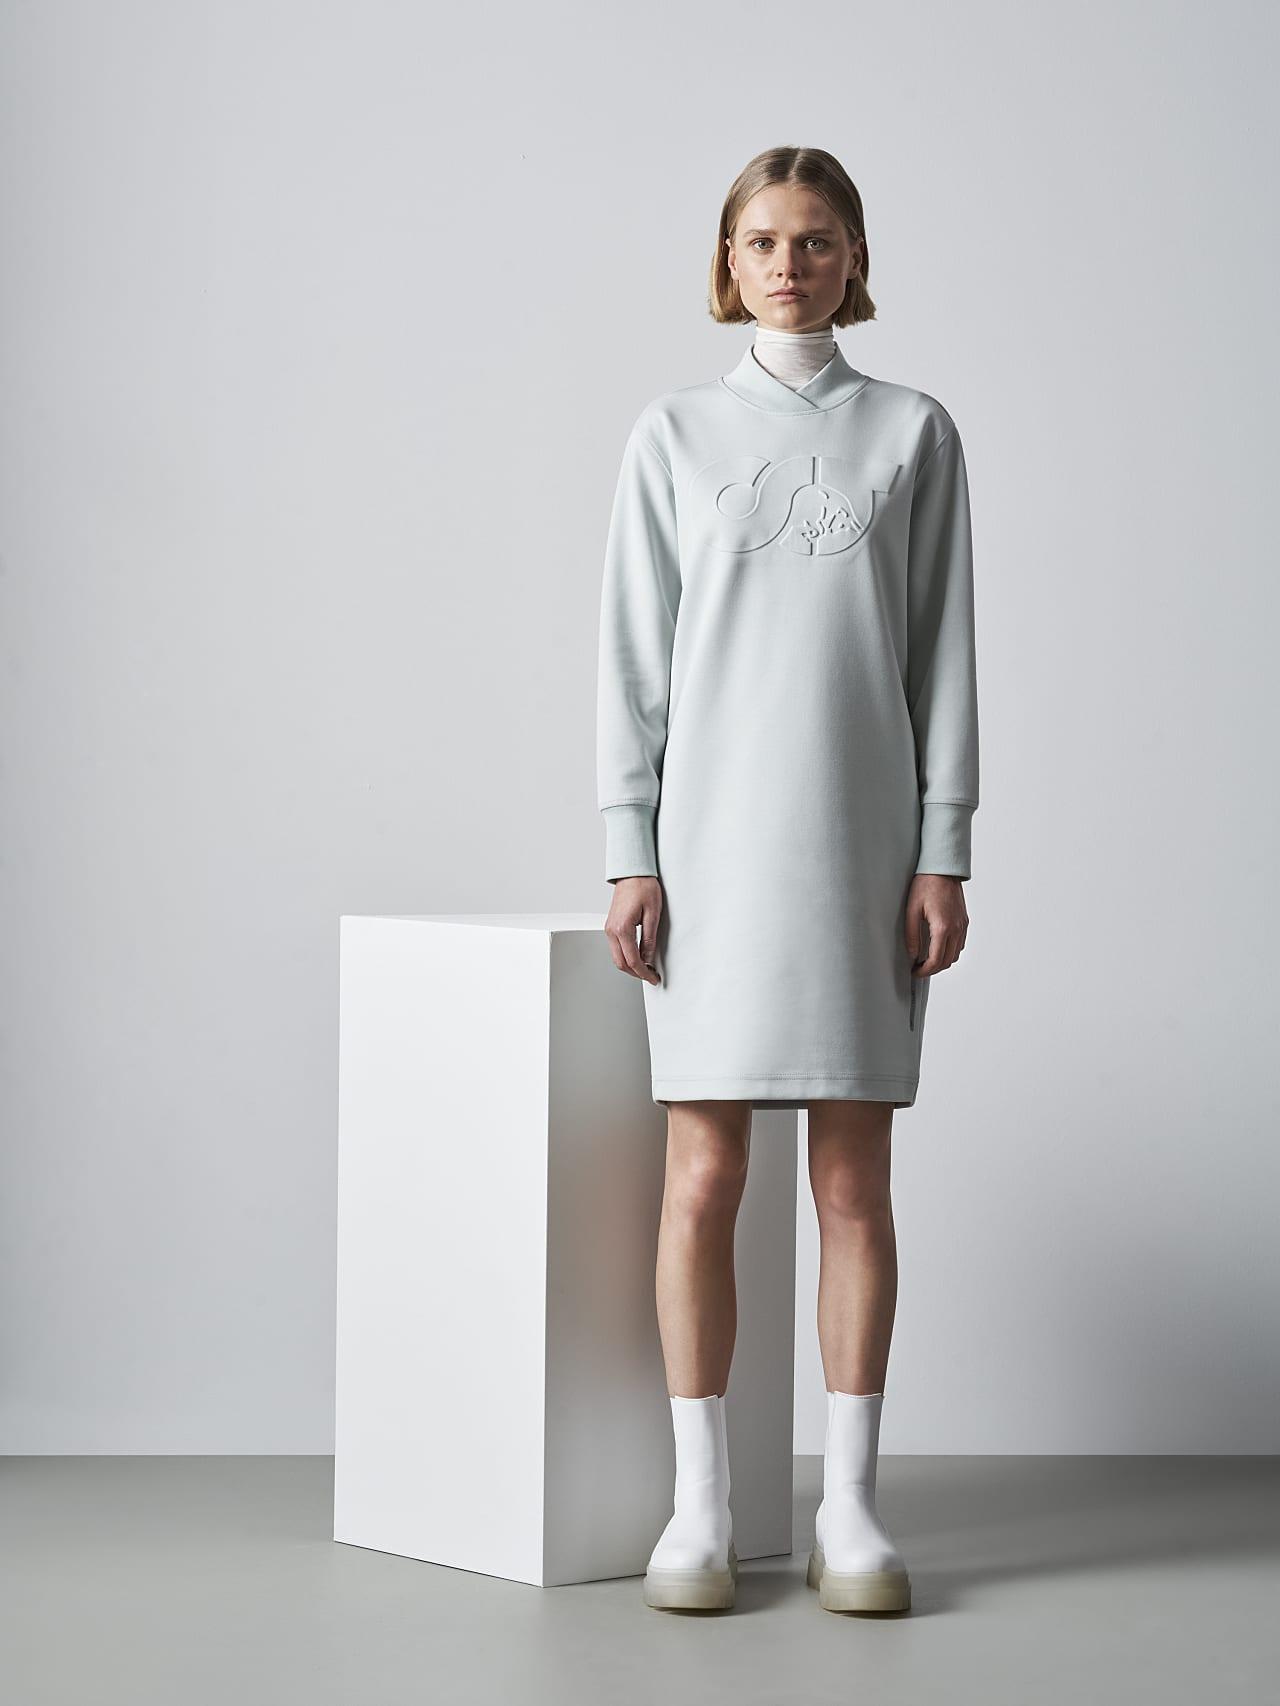 STAR V3.Y5.02 Premium Logo Sweater Dress Pale Blue  Front Alpha Tauri